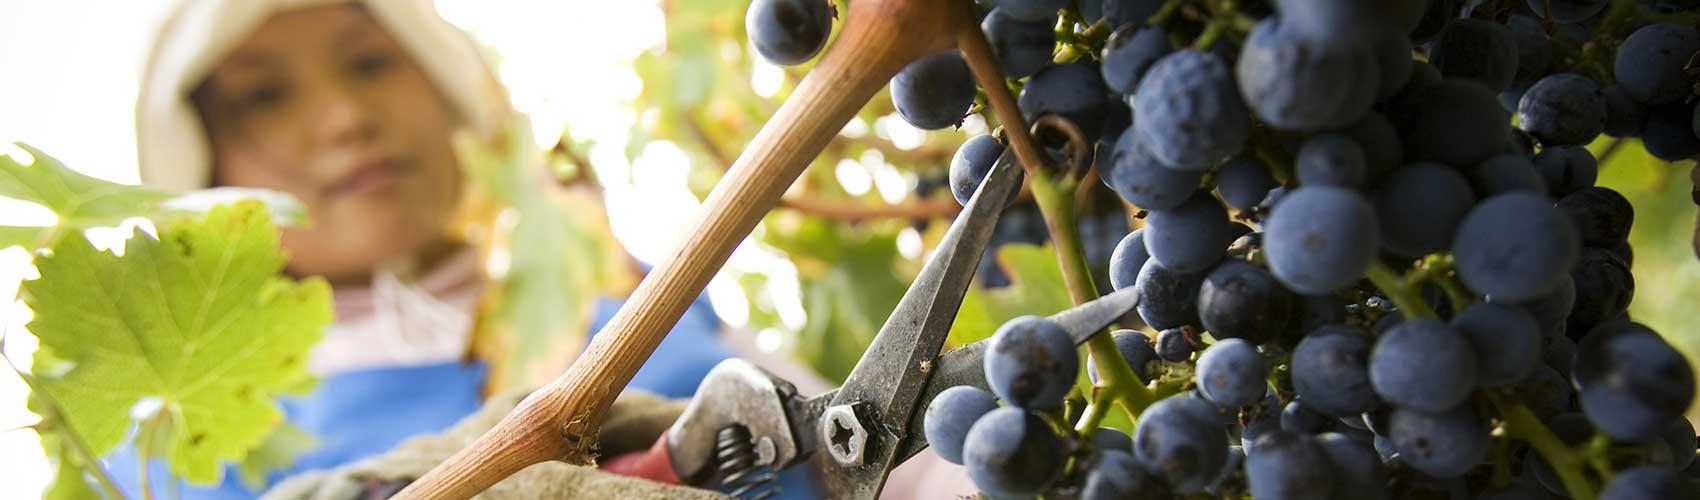 Woman picking grapes at Wild Dog Winery, Warragul